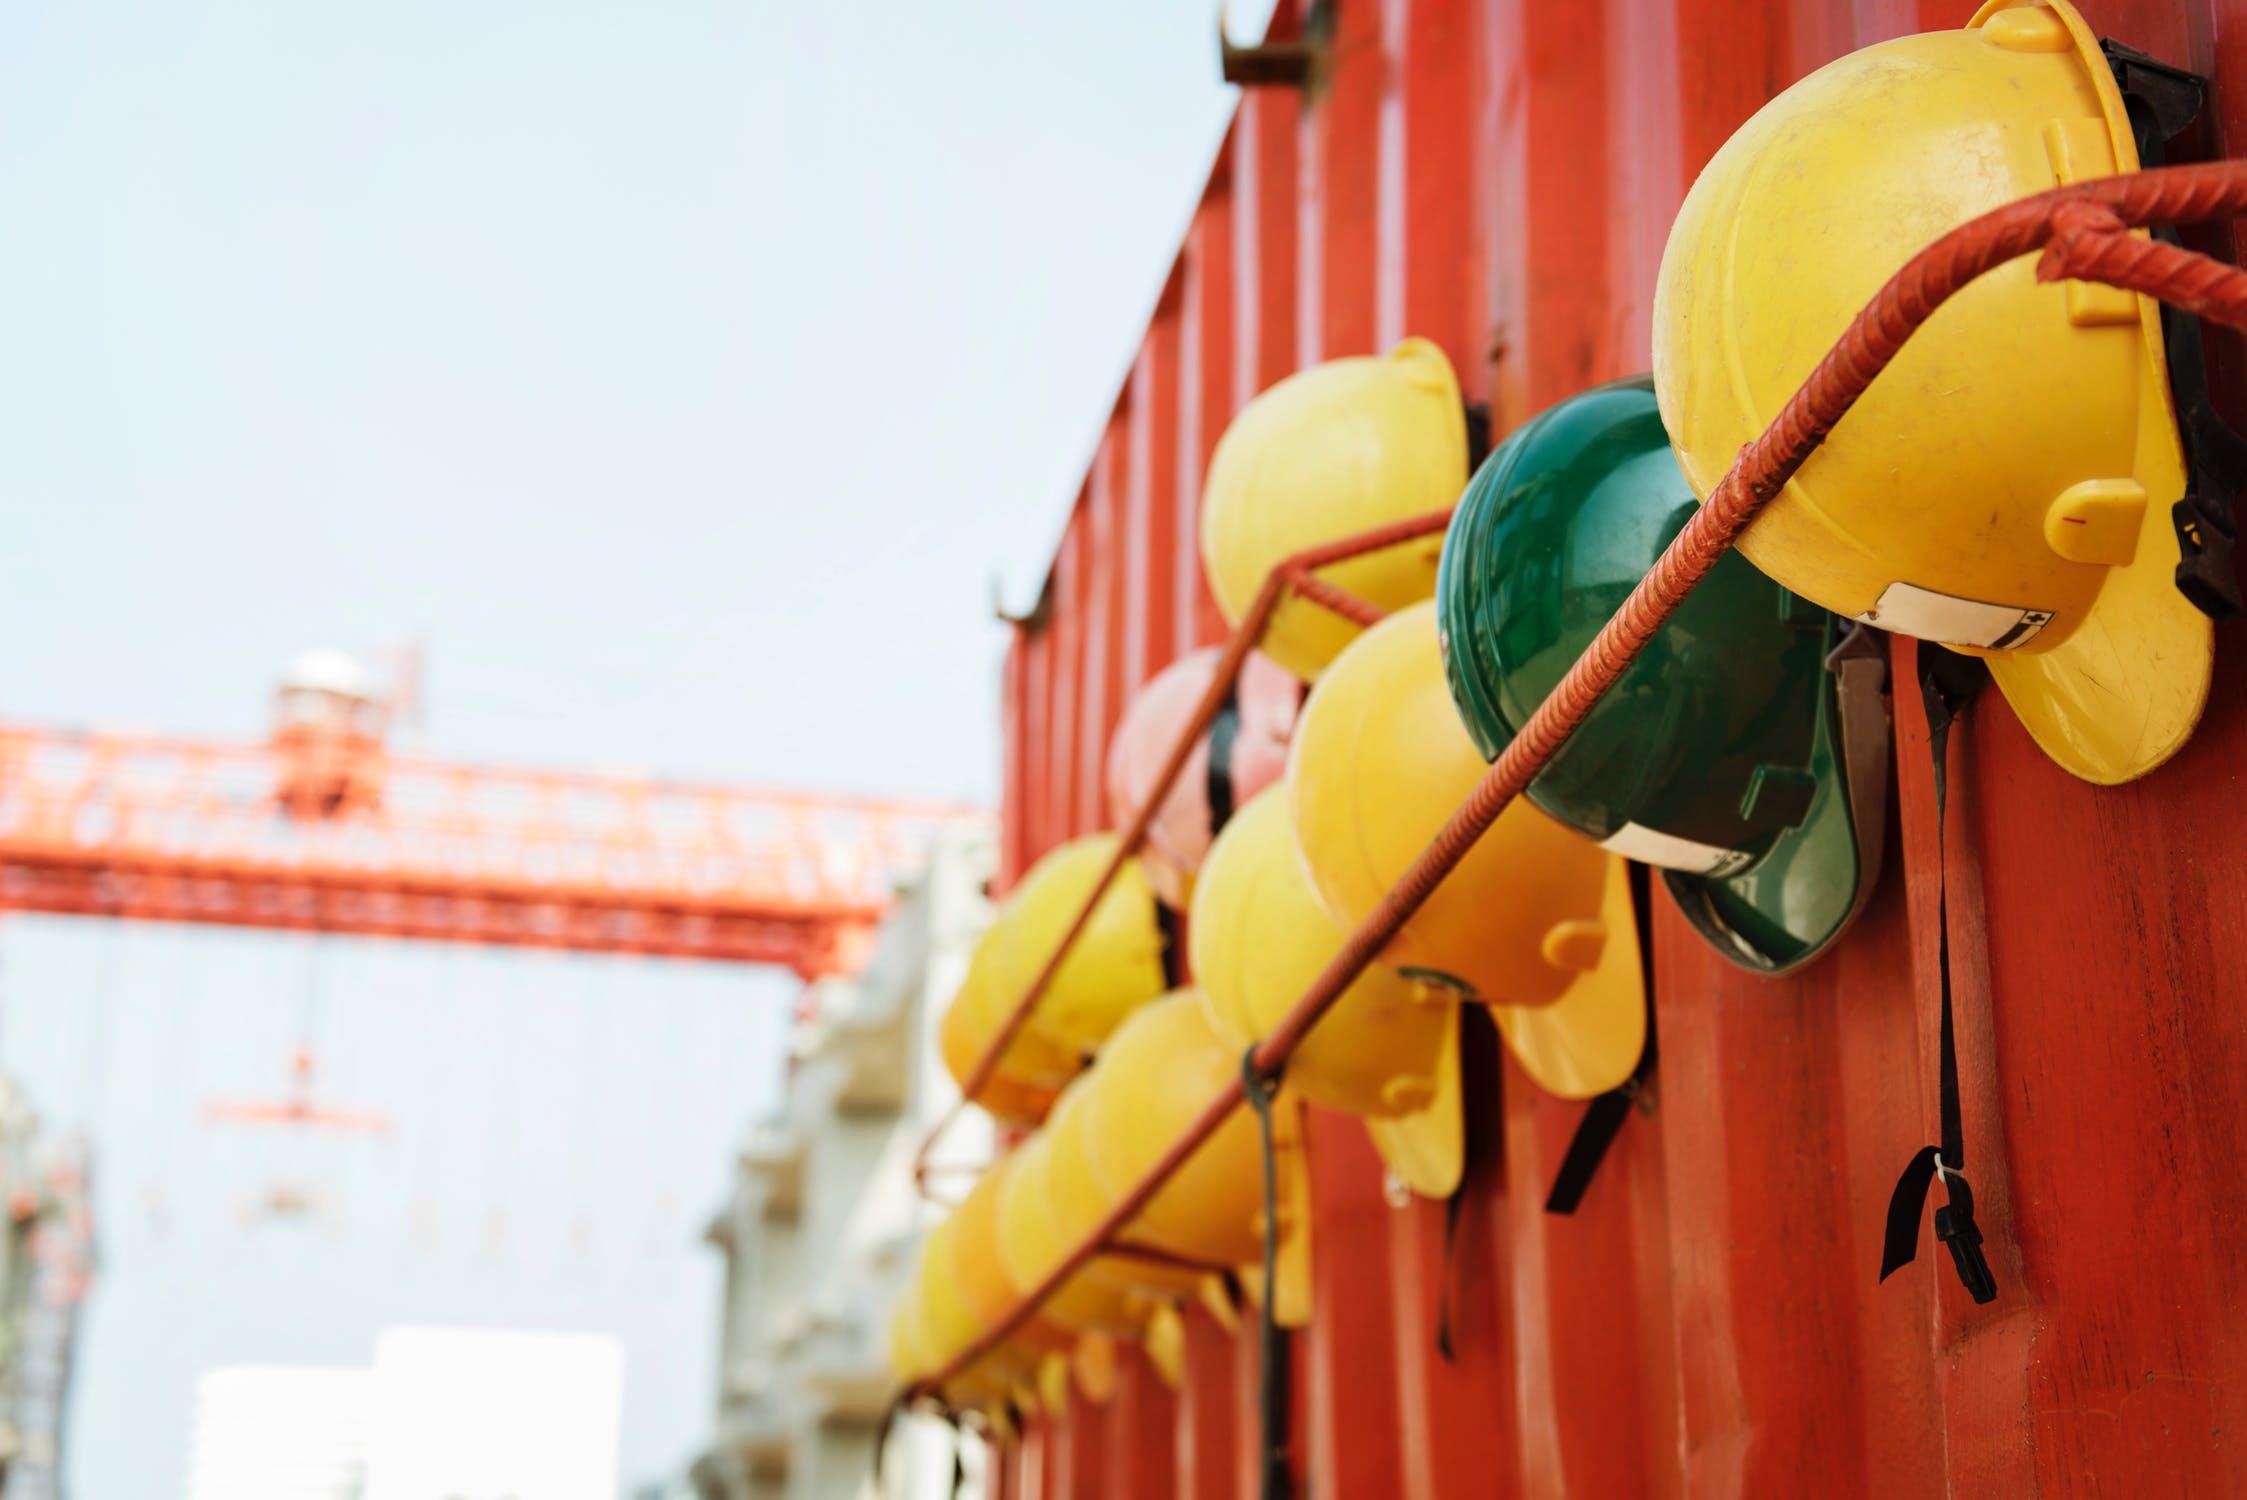 A Trustable Partner For Construction Site